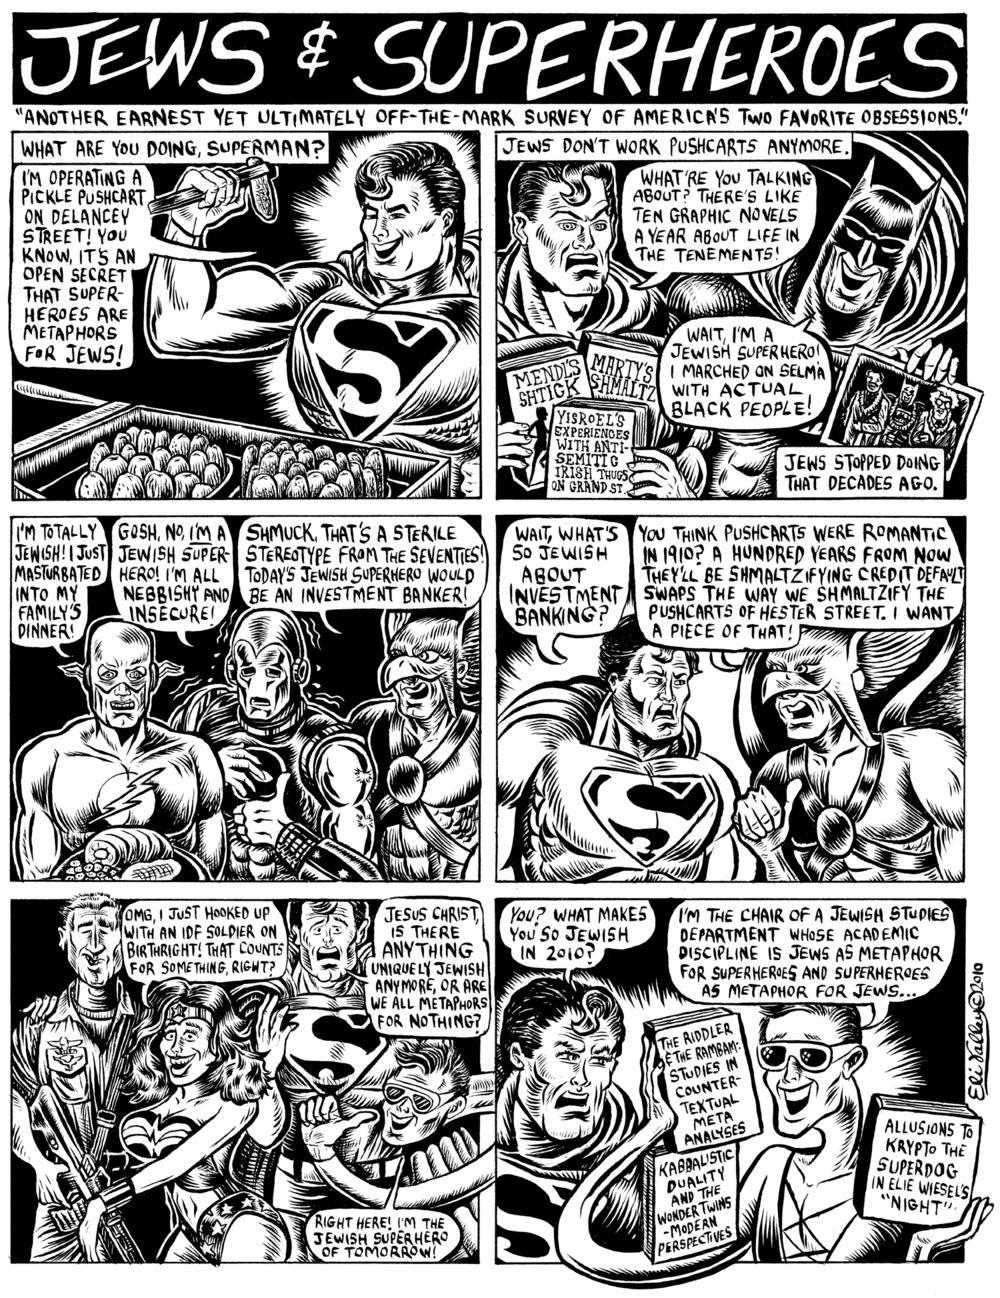 Jews And Superheroes. Shofar, Winter 2011